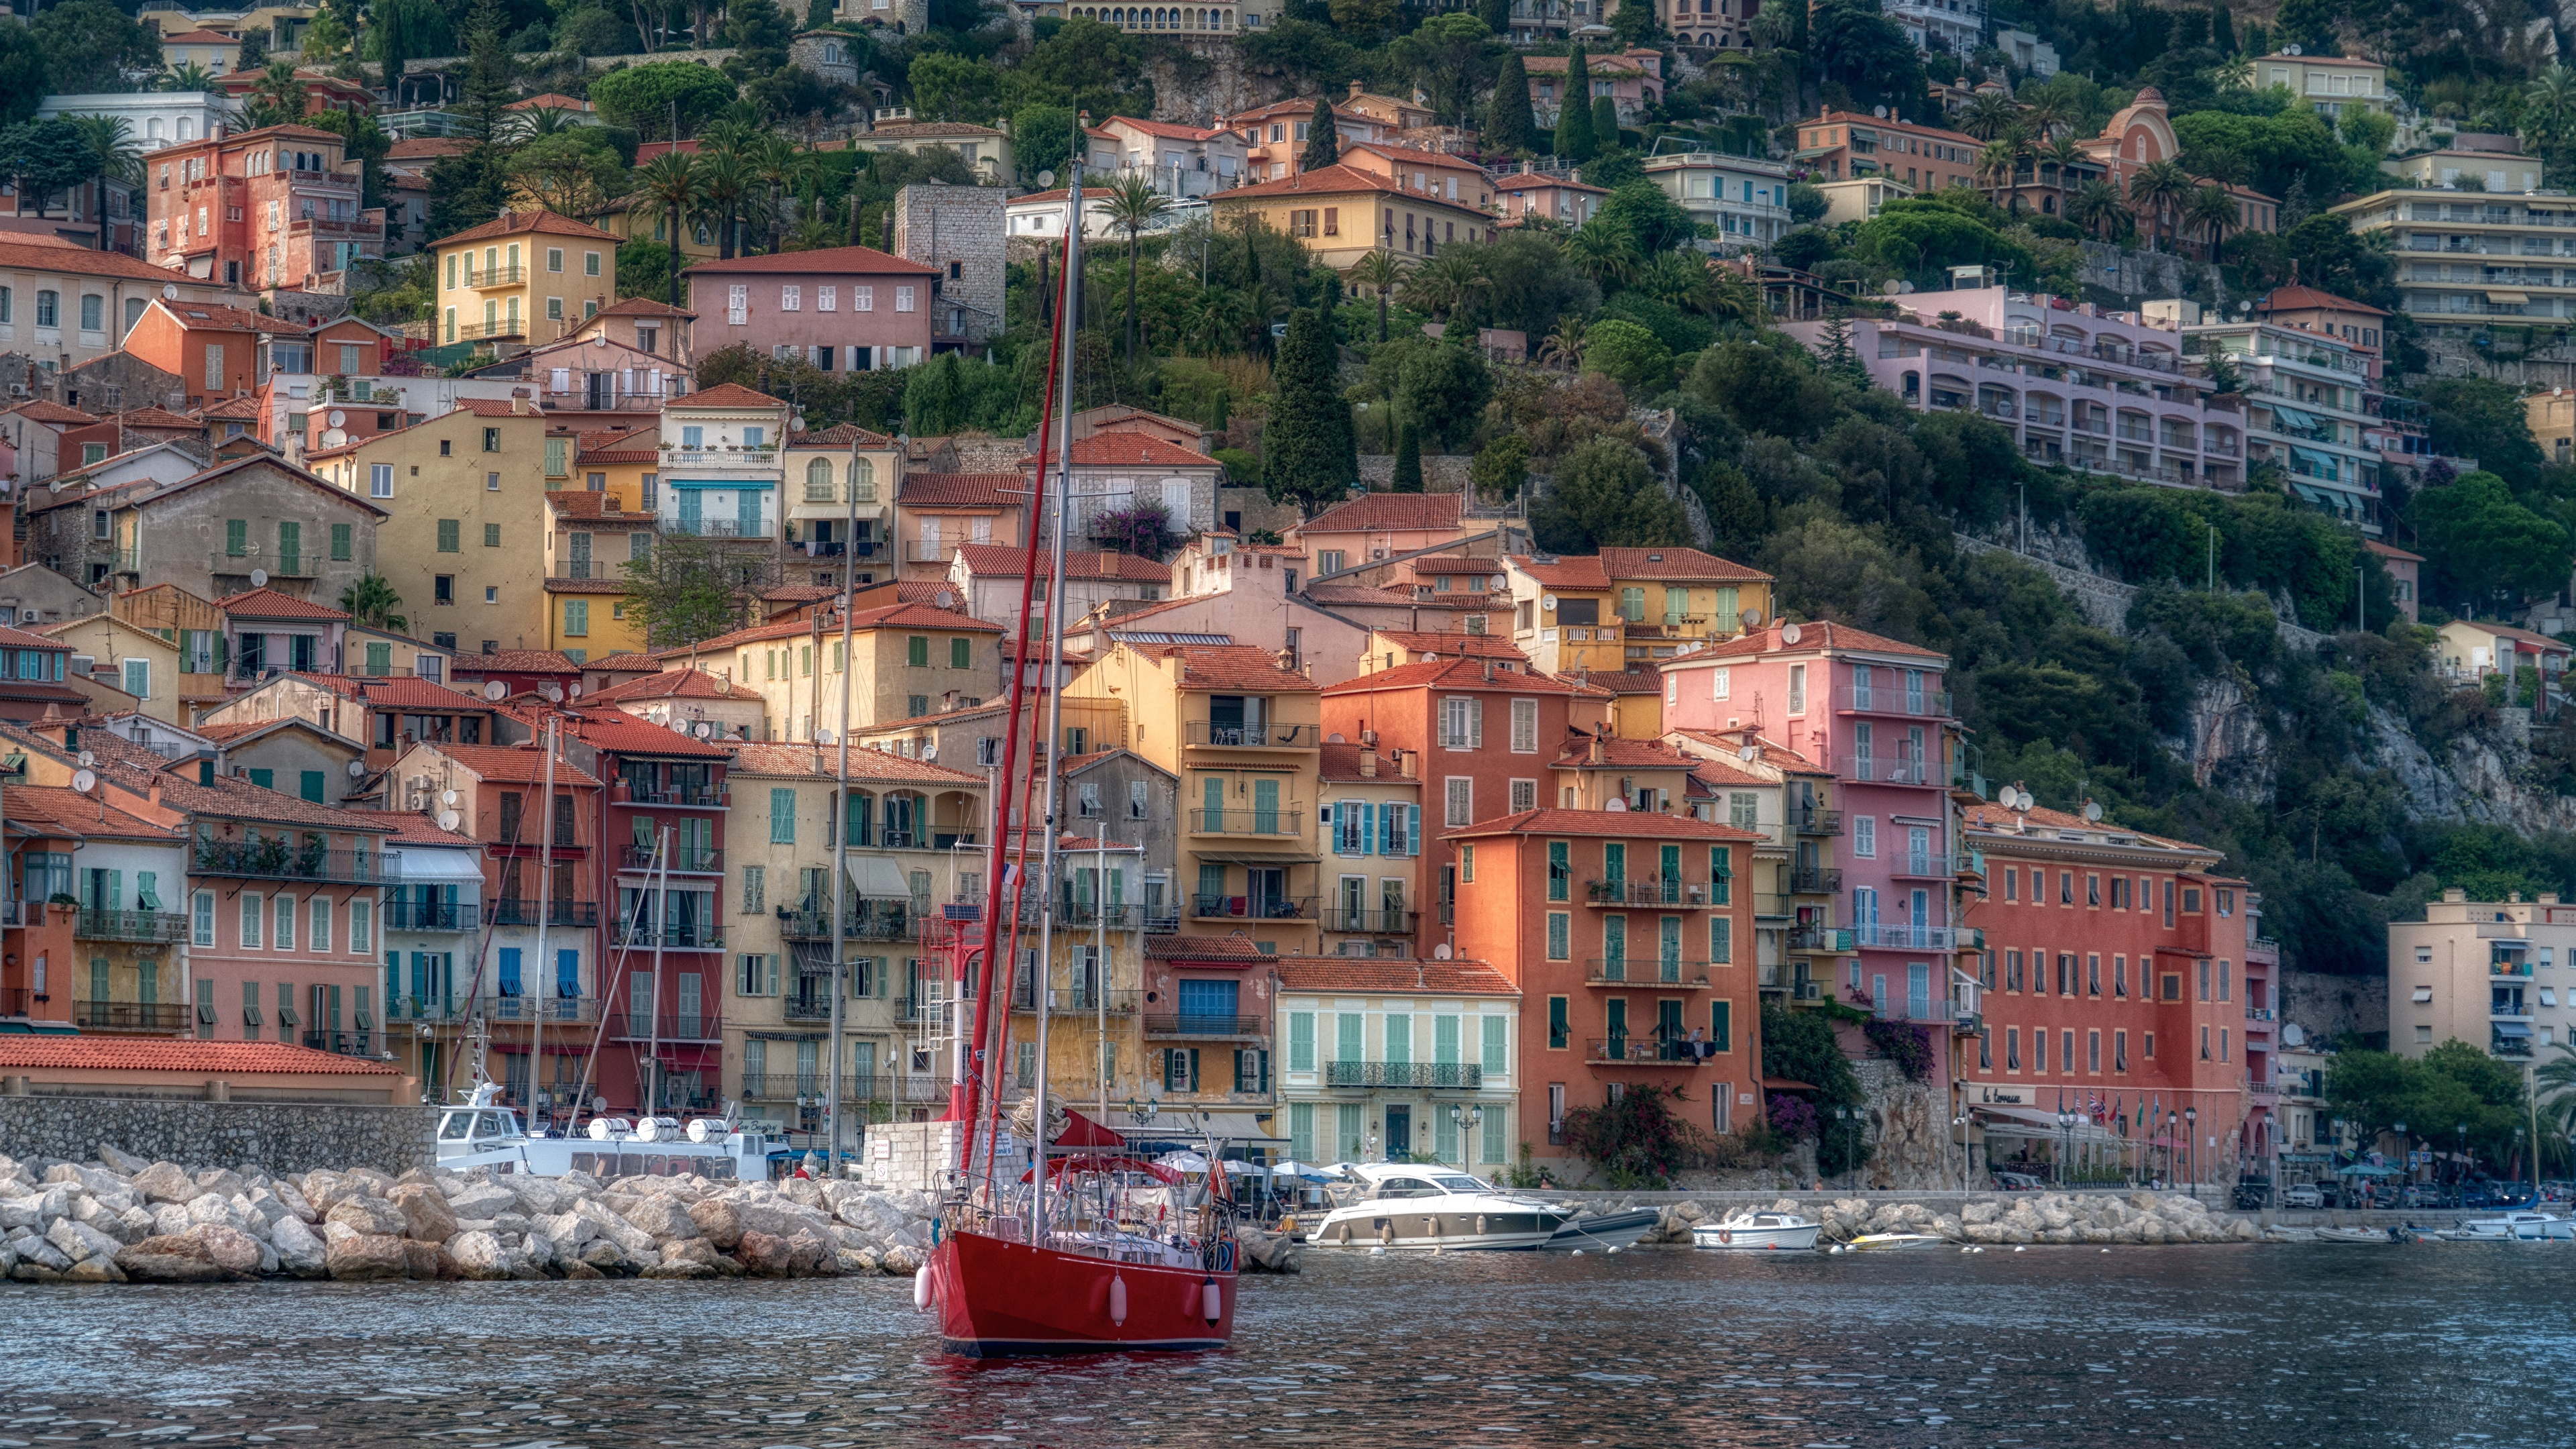 Картинка Франция French Riviera Villefranche-sur-Mer HDRI Яхта Побережье Дома город 3840x2160 HDR берег Города Здания